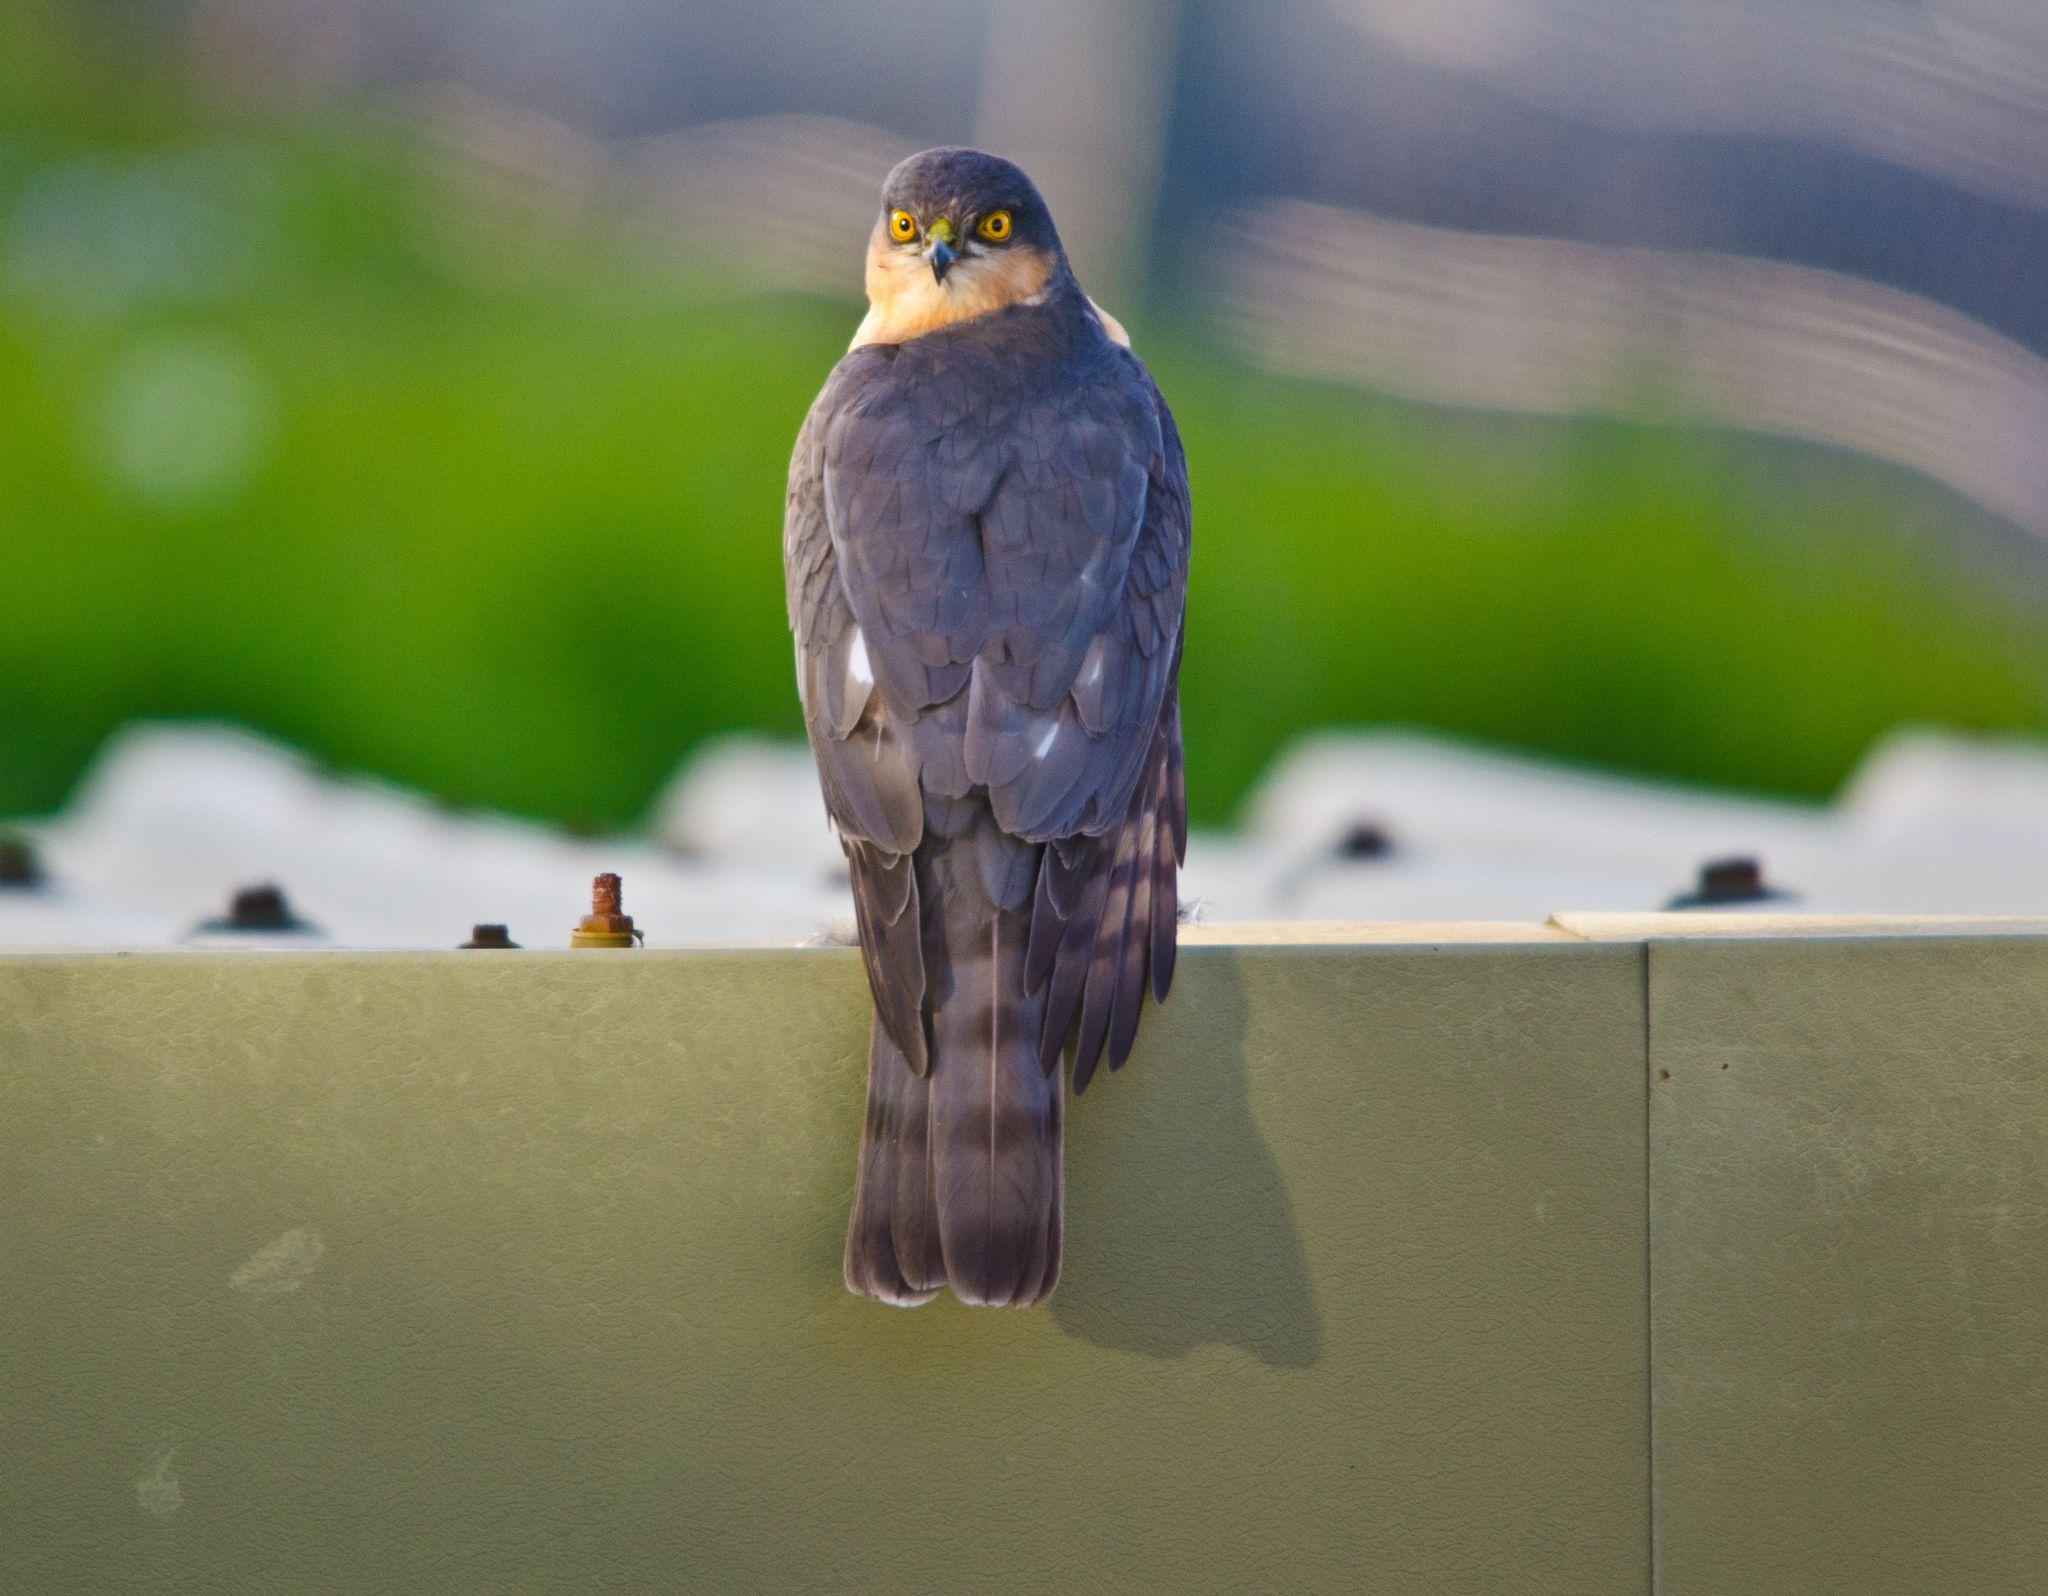 Sparrowhawk surprise  by darron.sandell